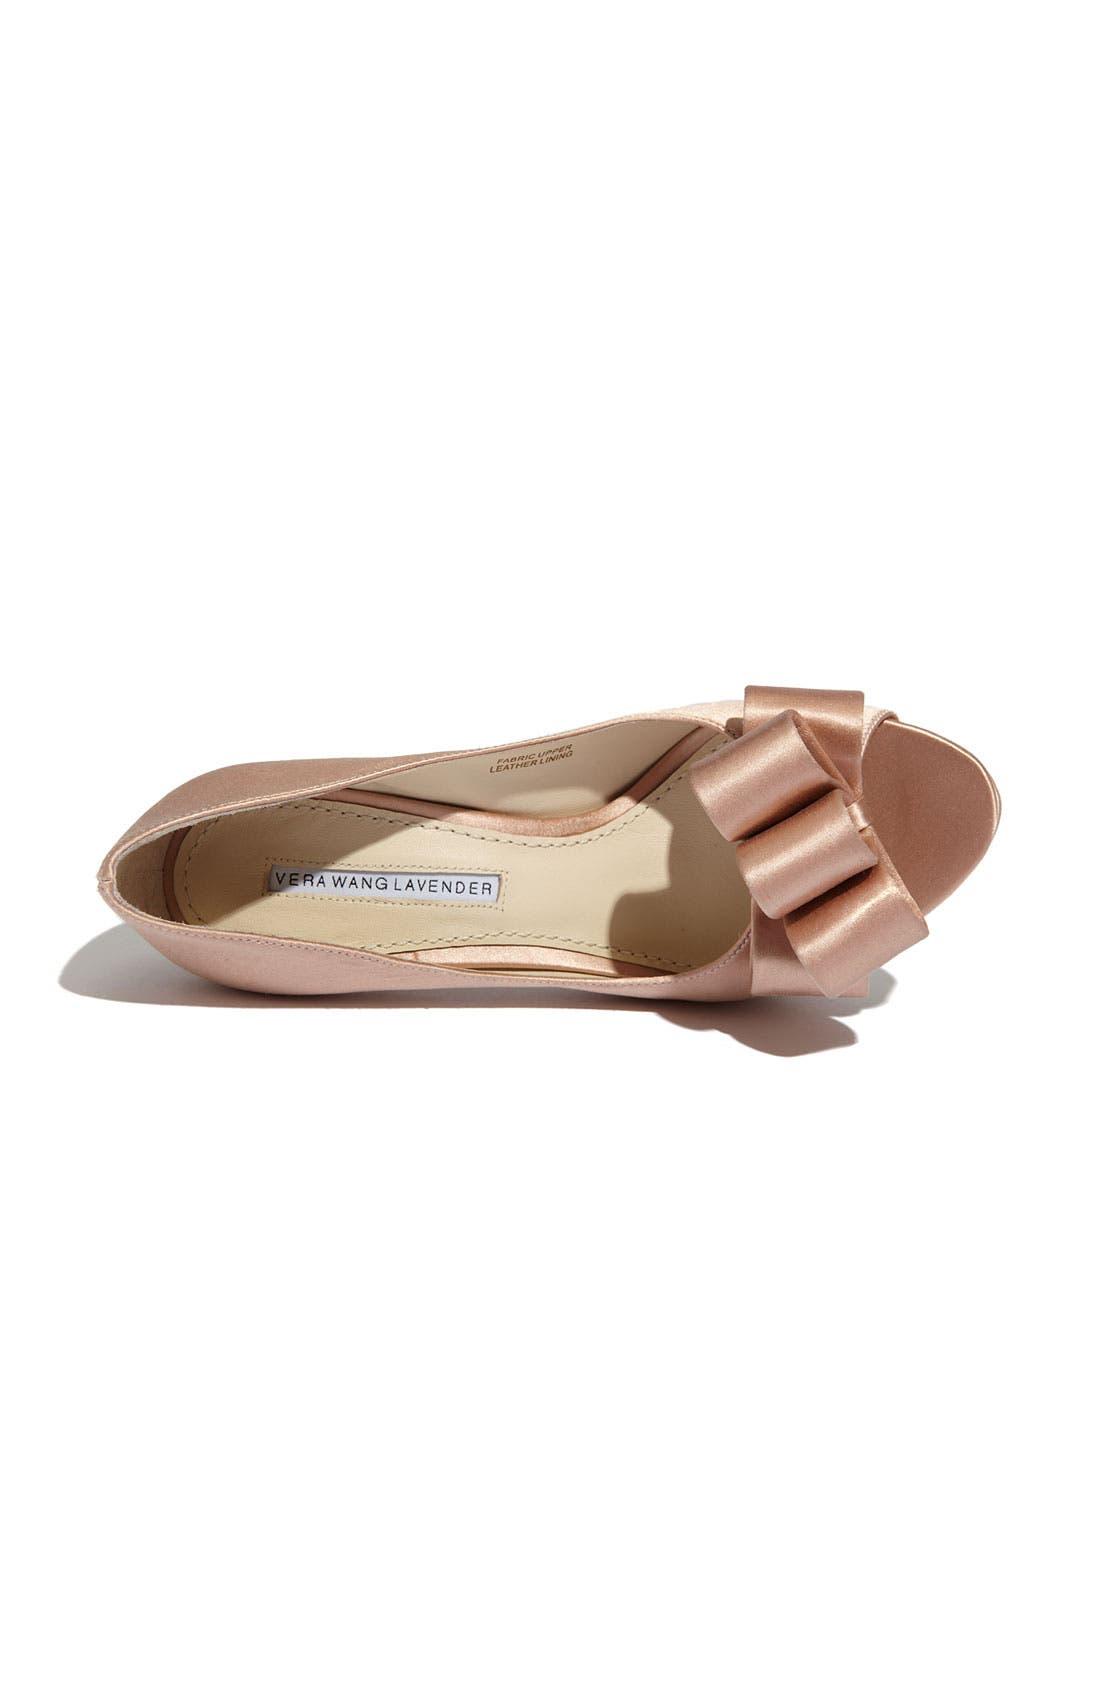 Footwear 'Sammy' Peep Toe Pump,                             Alternate thumbnail 2, color,                             250